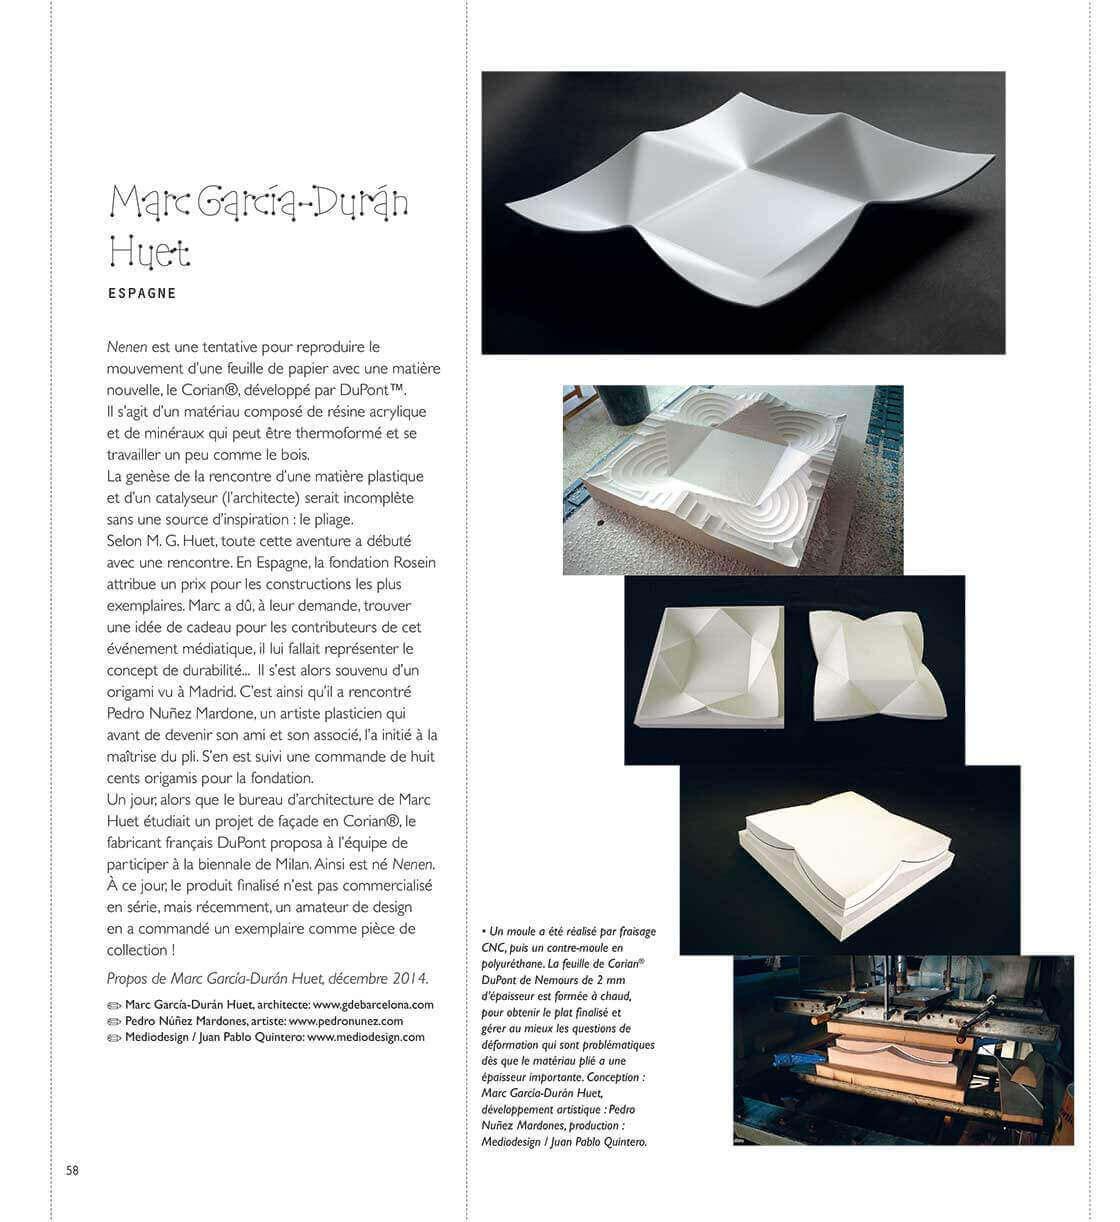 Un nouvelle art du pli - pagina 58 @Marc García-Durán, arquitecto